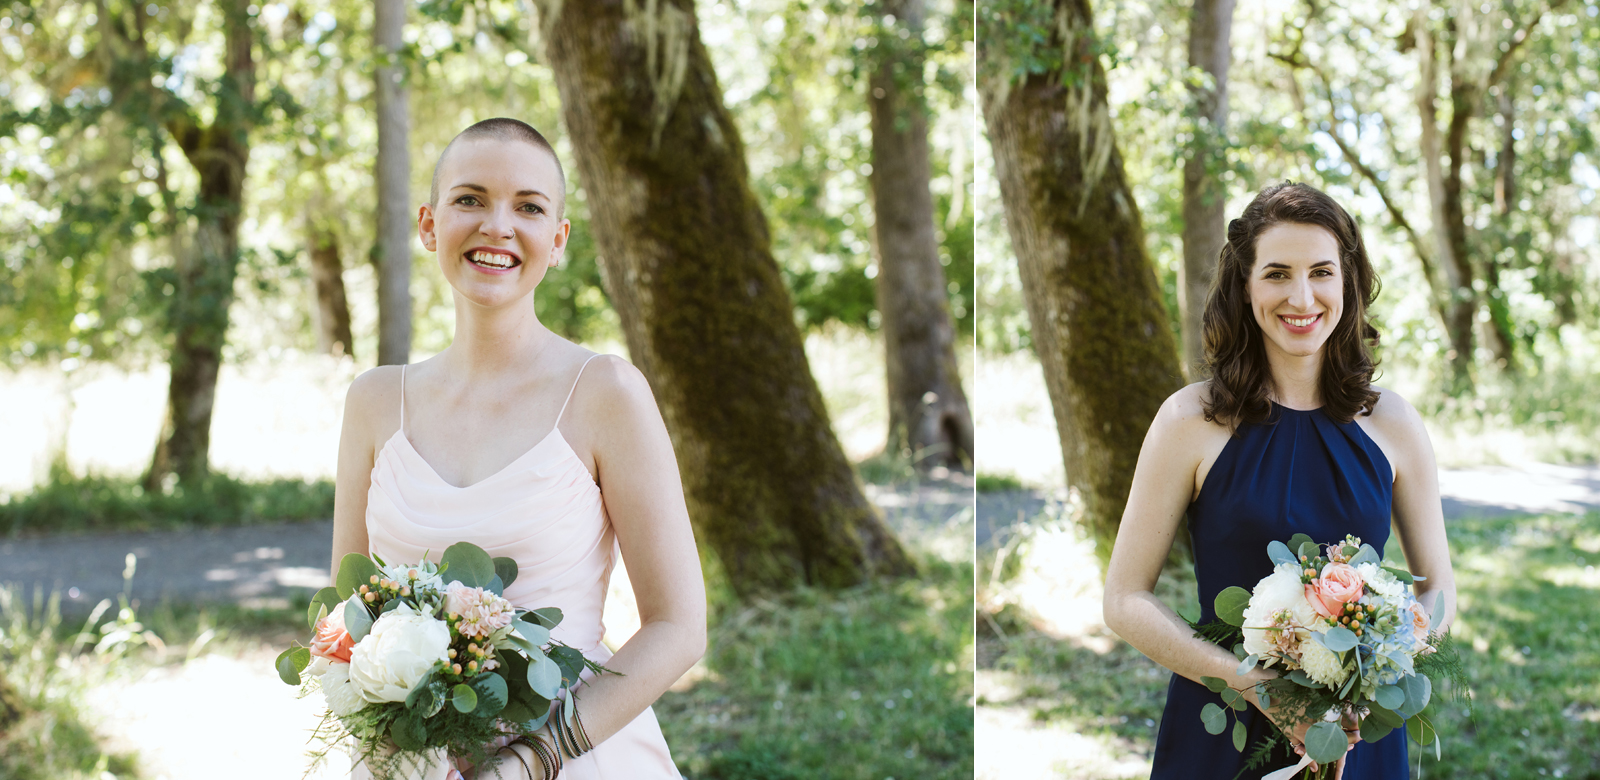 030-daronjackson-rachel-michael-wedding-mtpisgah.jpg